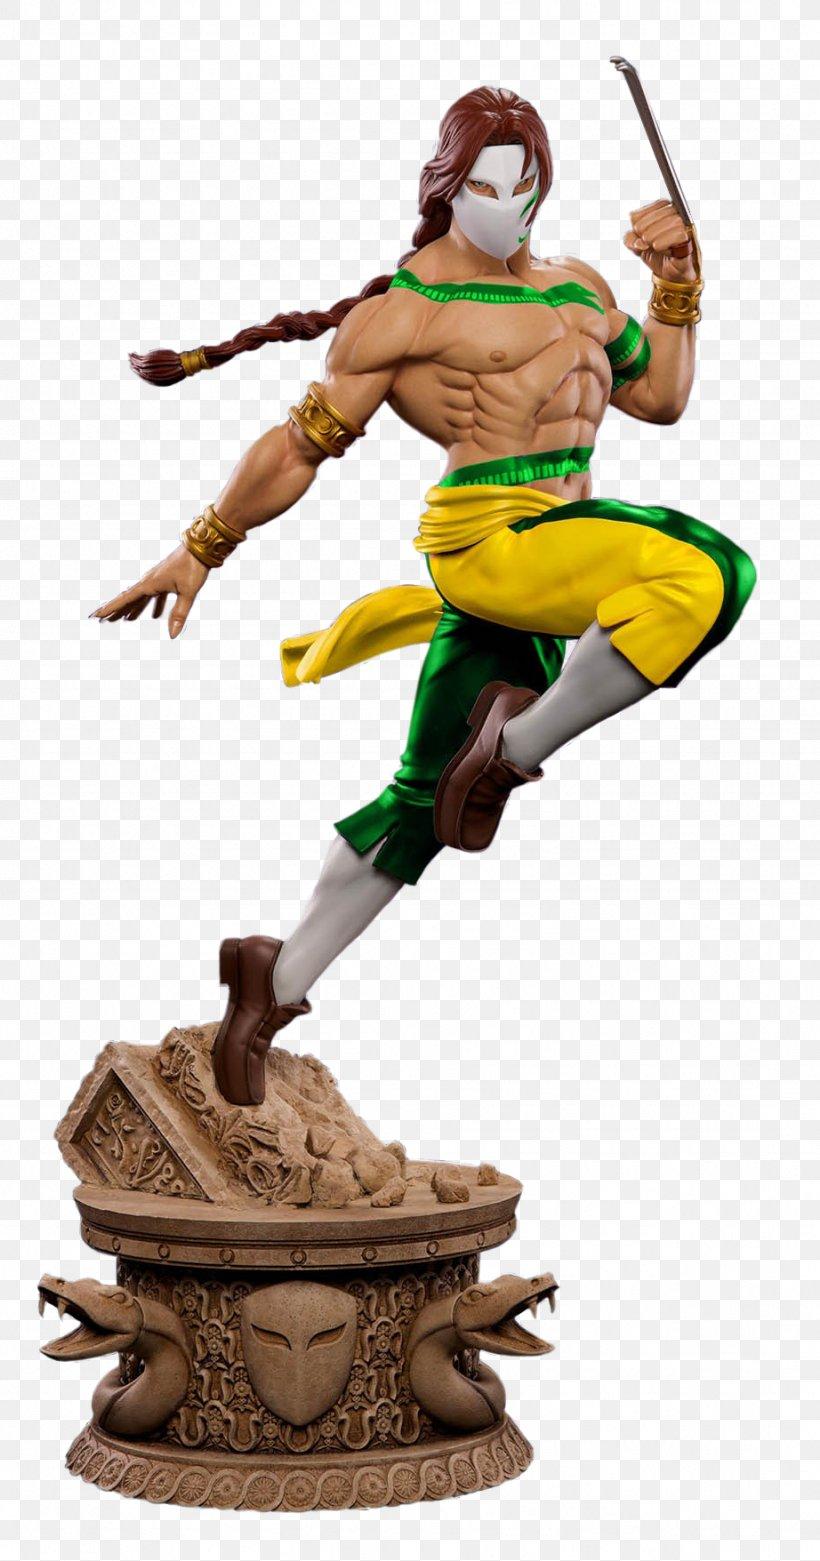 Vega Ultra Street Fighter Ii The Final Challengers Statue